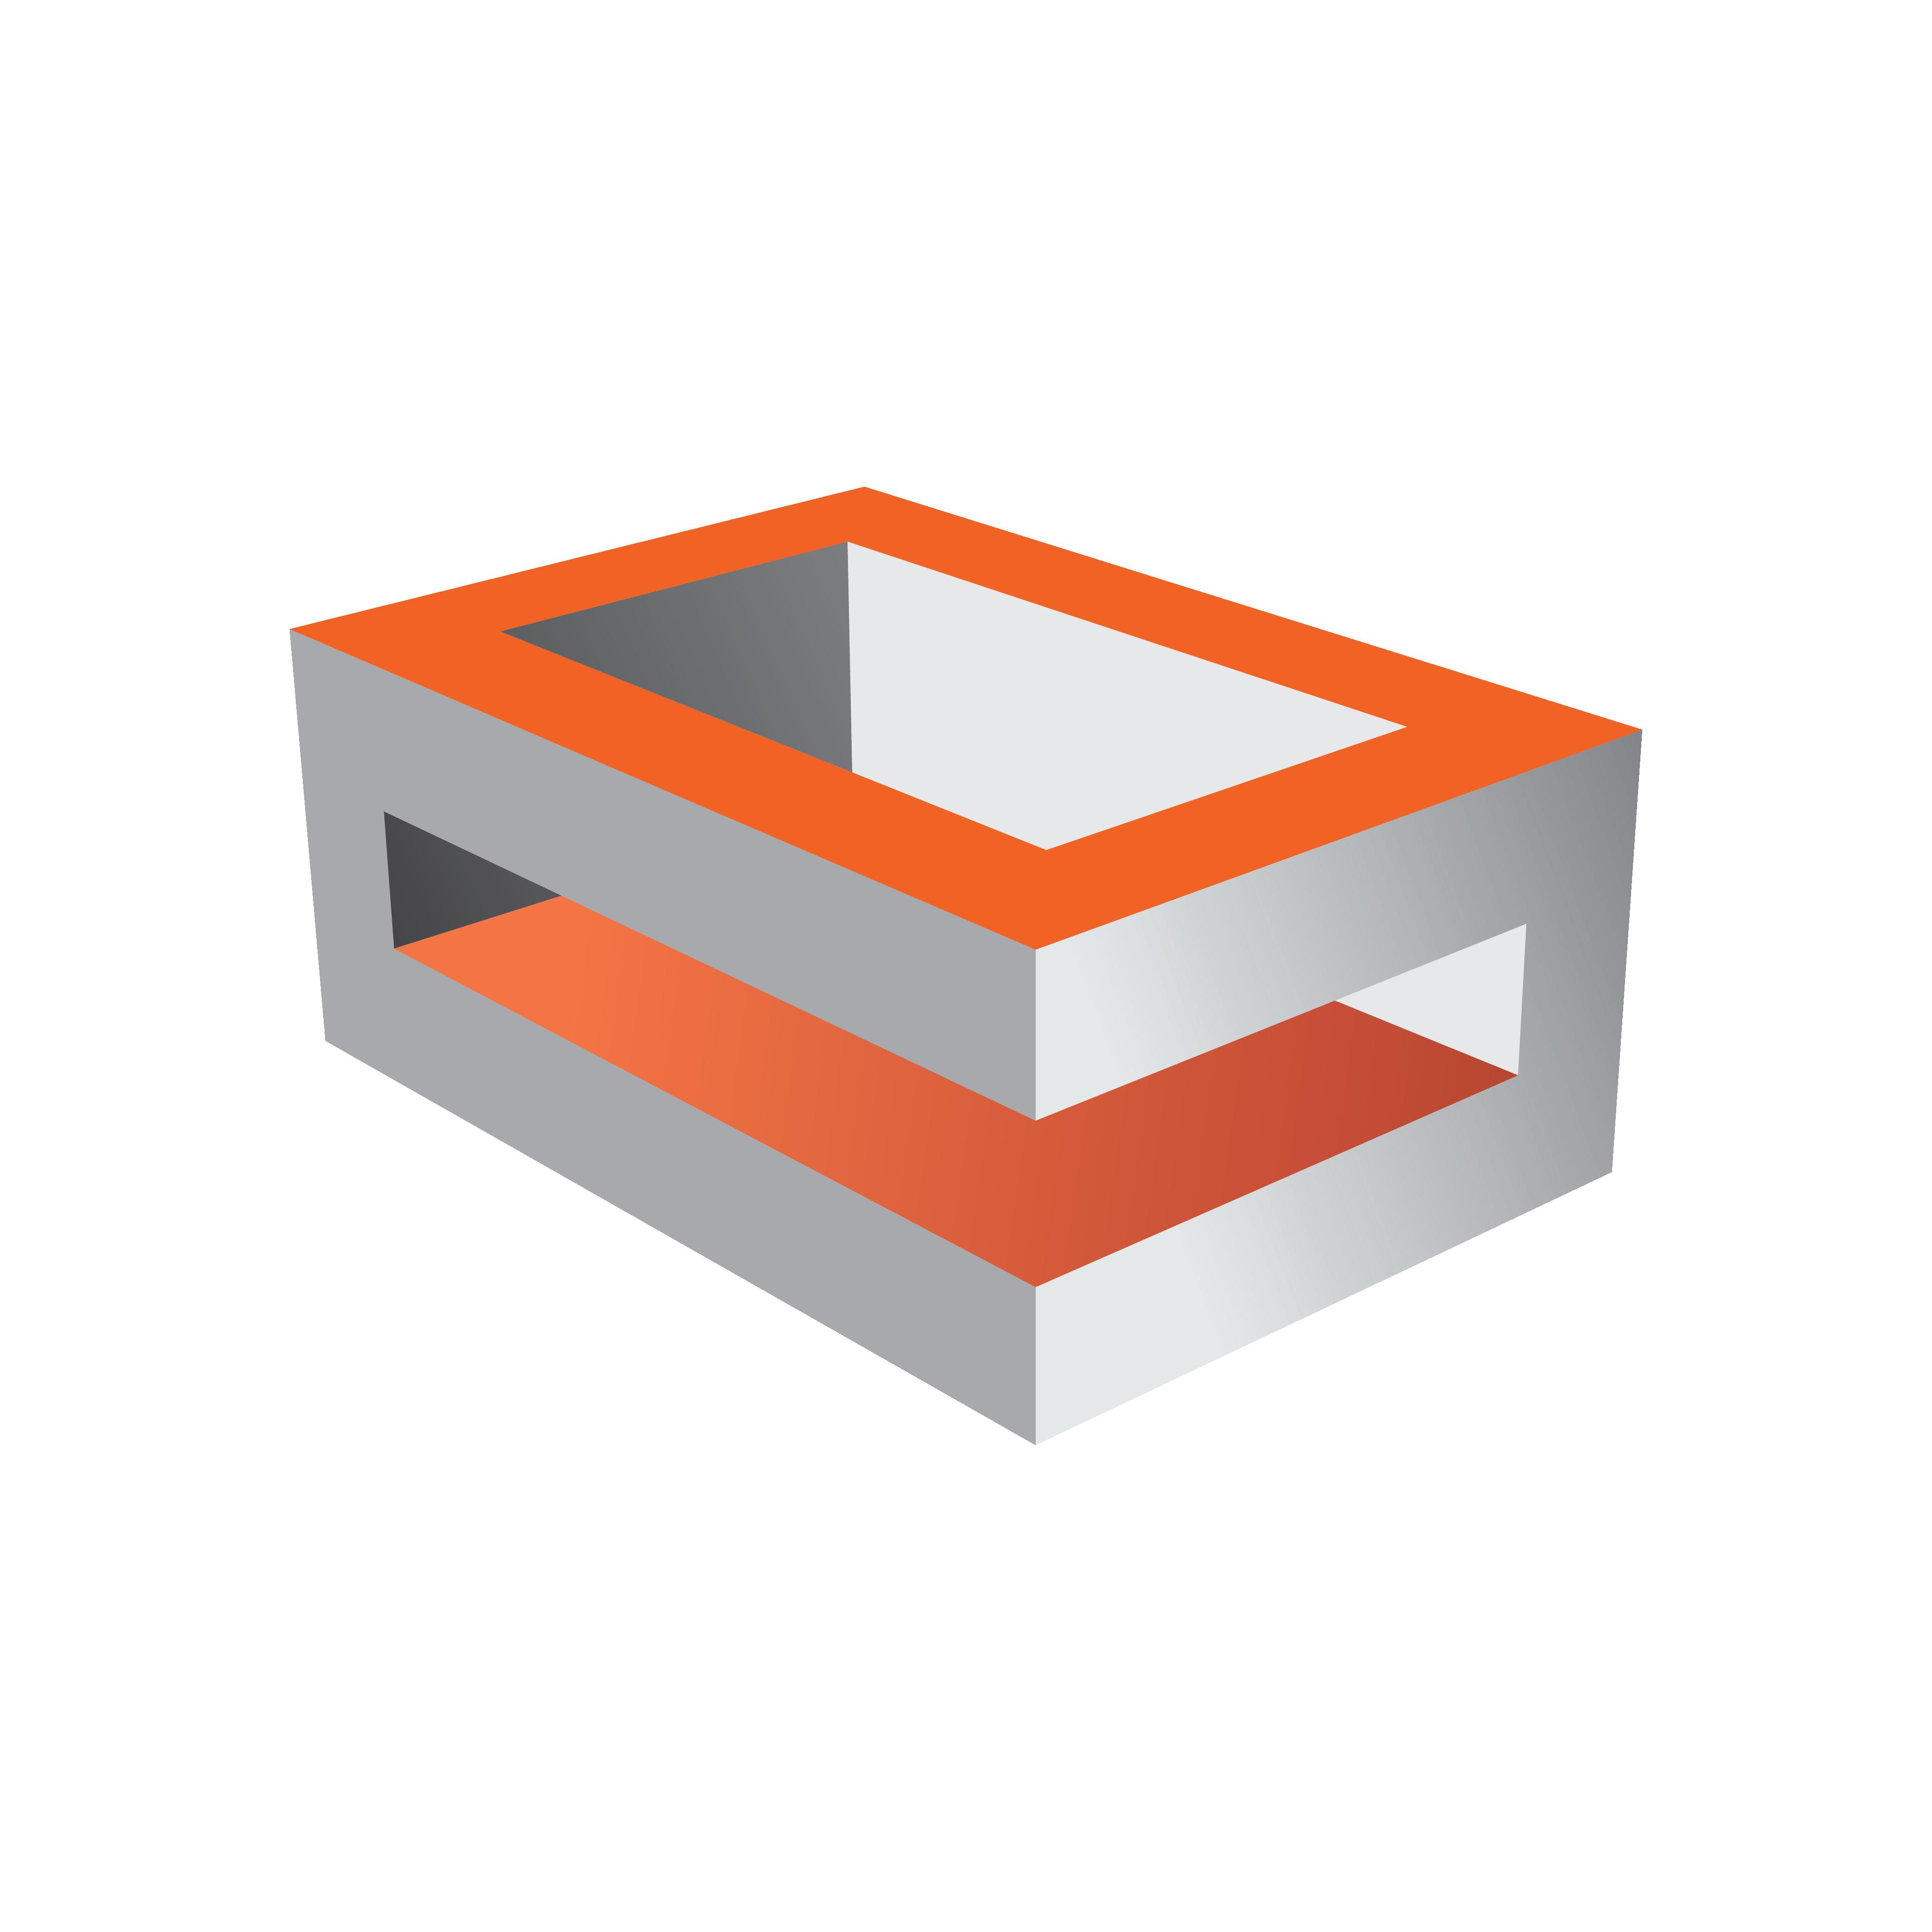 Overview - Viz Artist and Engine